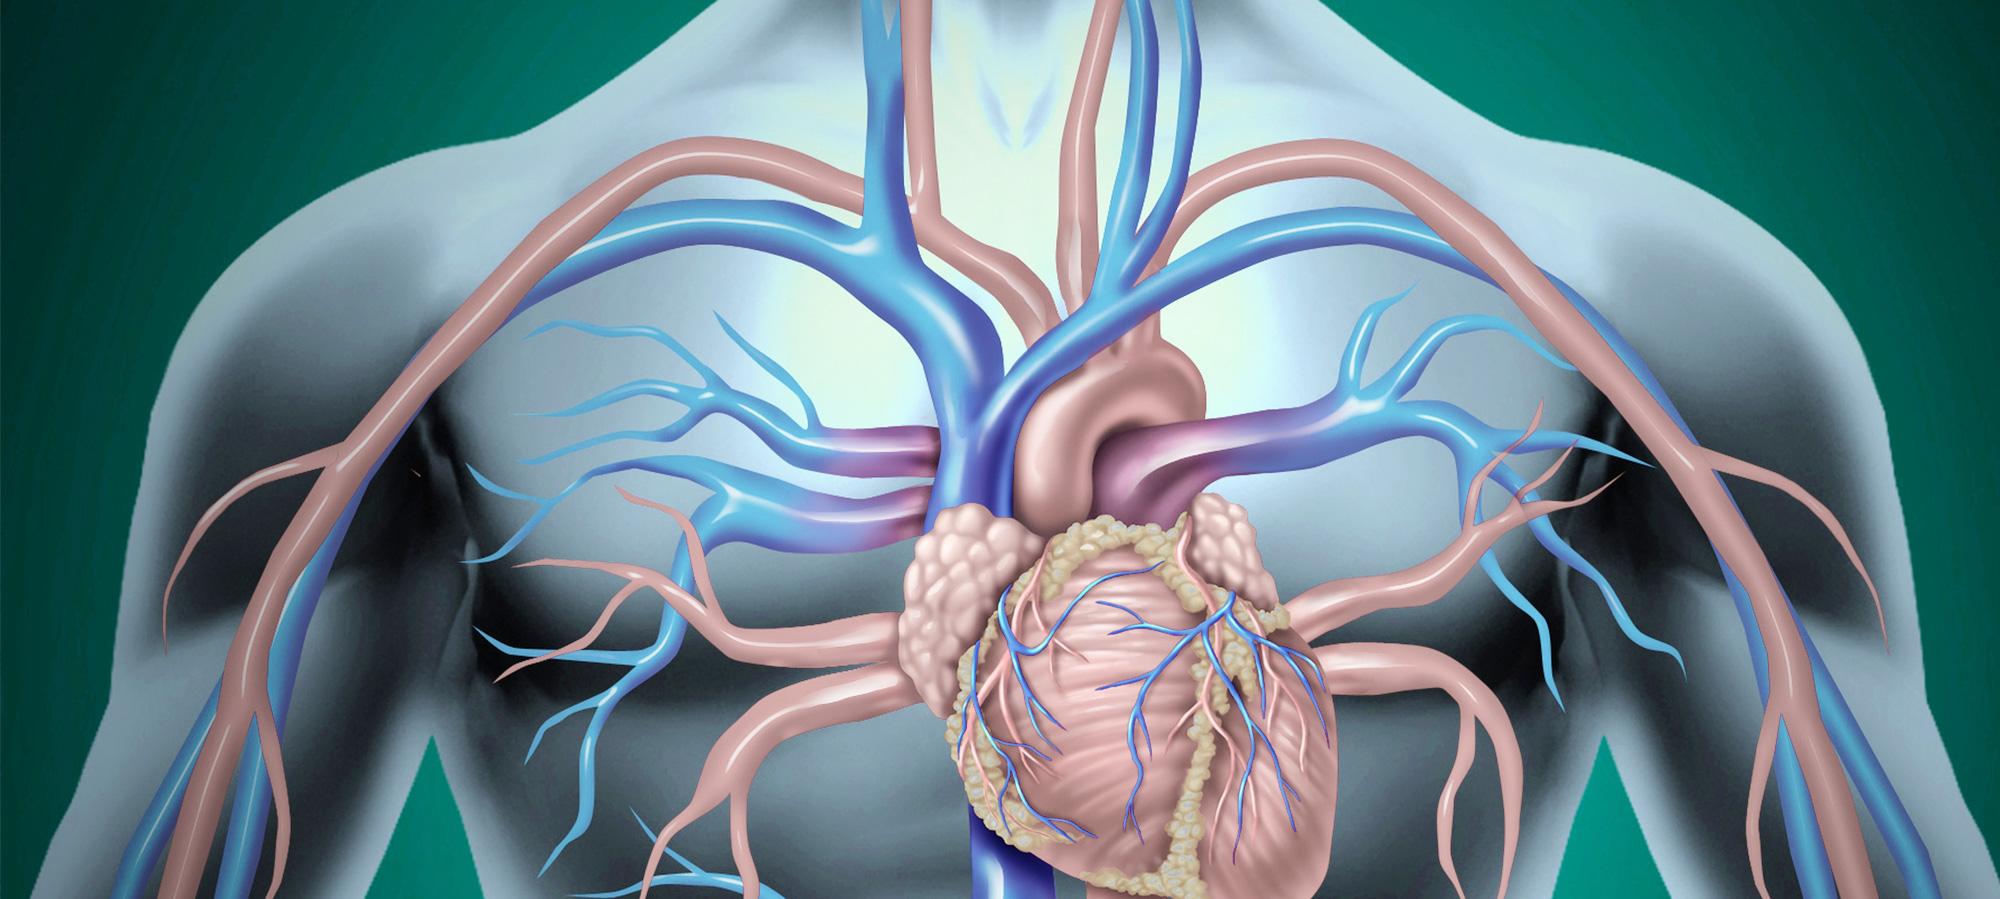 Hyperpegmentation dopo un flebektomiya